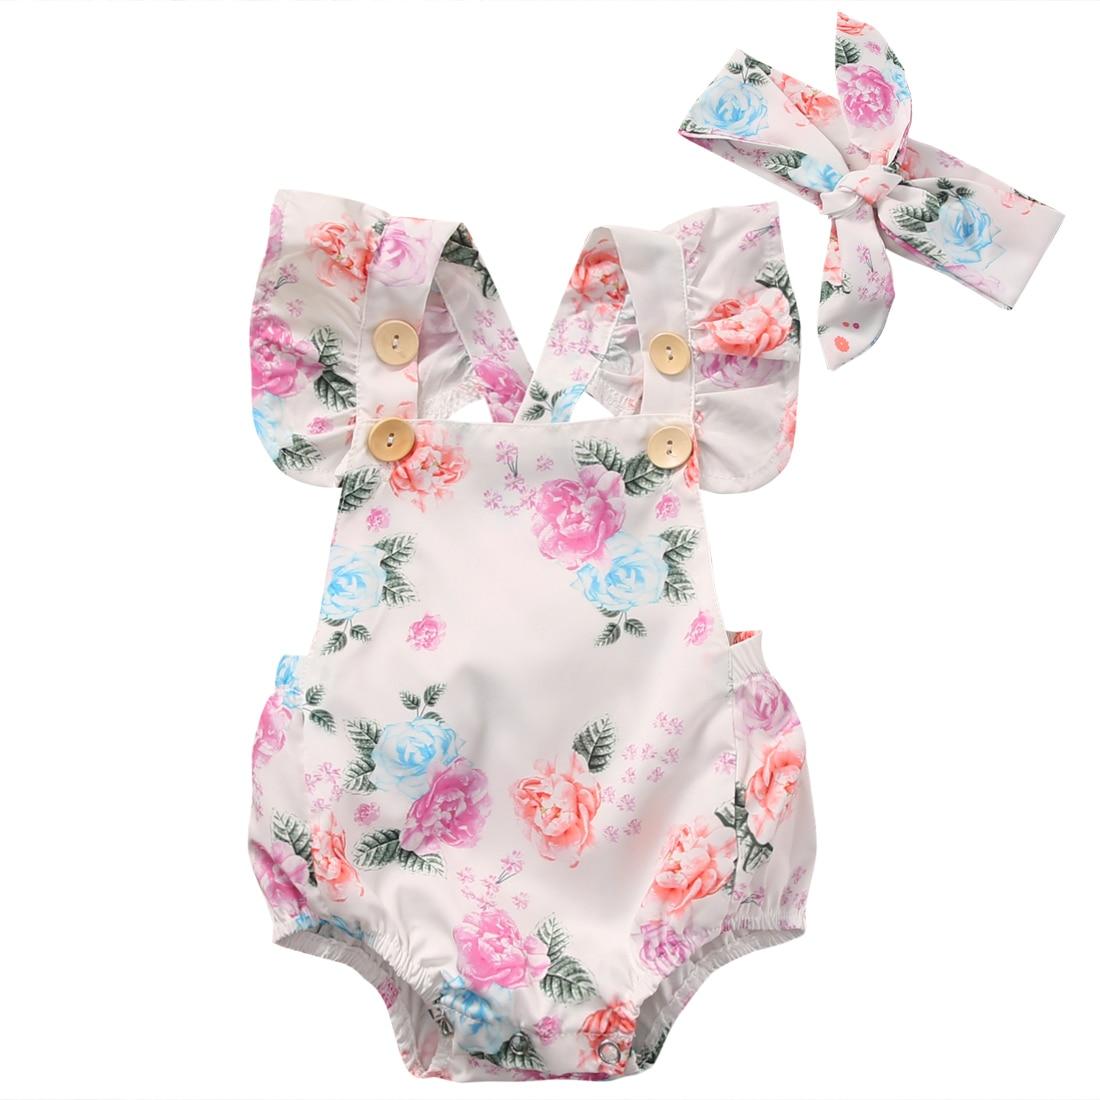 Summer Cute Baby Floral Bodysuit Adorable Baby Girls Short Sleeve Floral Bodysuits Headband One-pieces 2Pcs Clothes Sunsuit Set